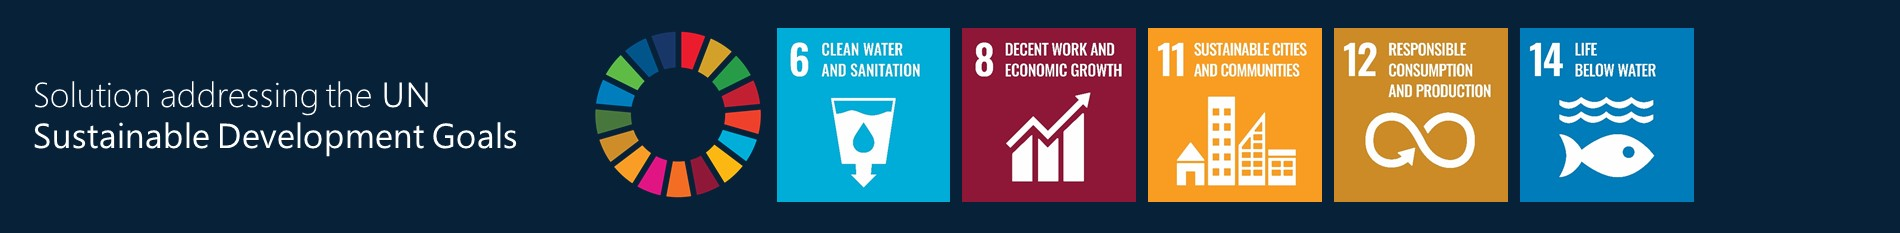 Sustainable Development Goals UN Circular Economy